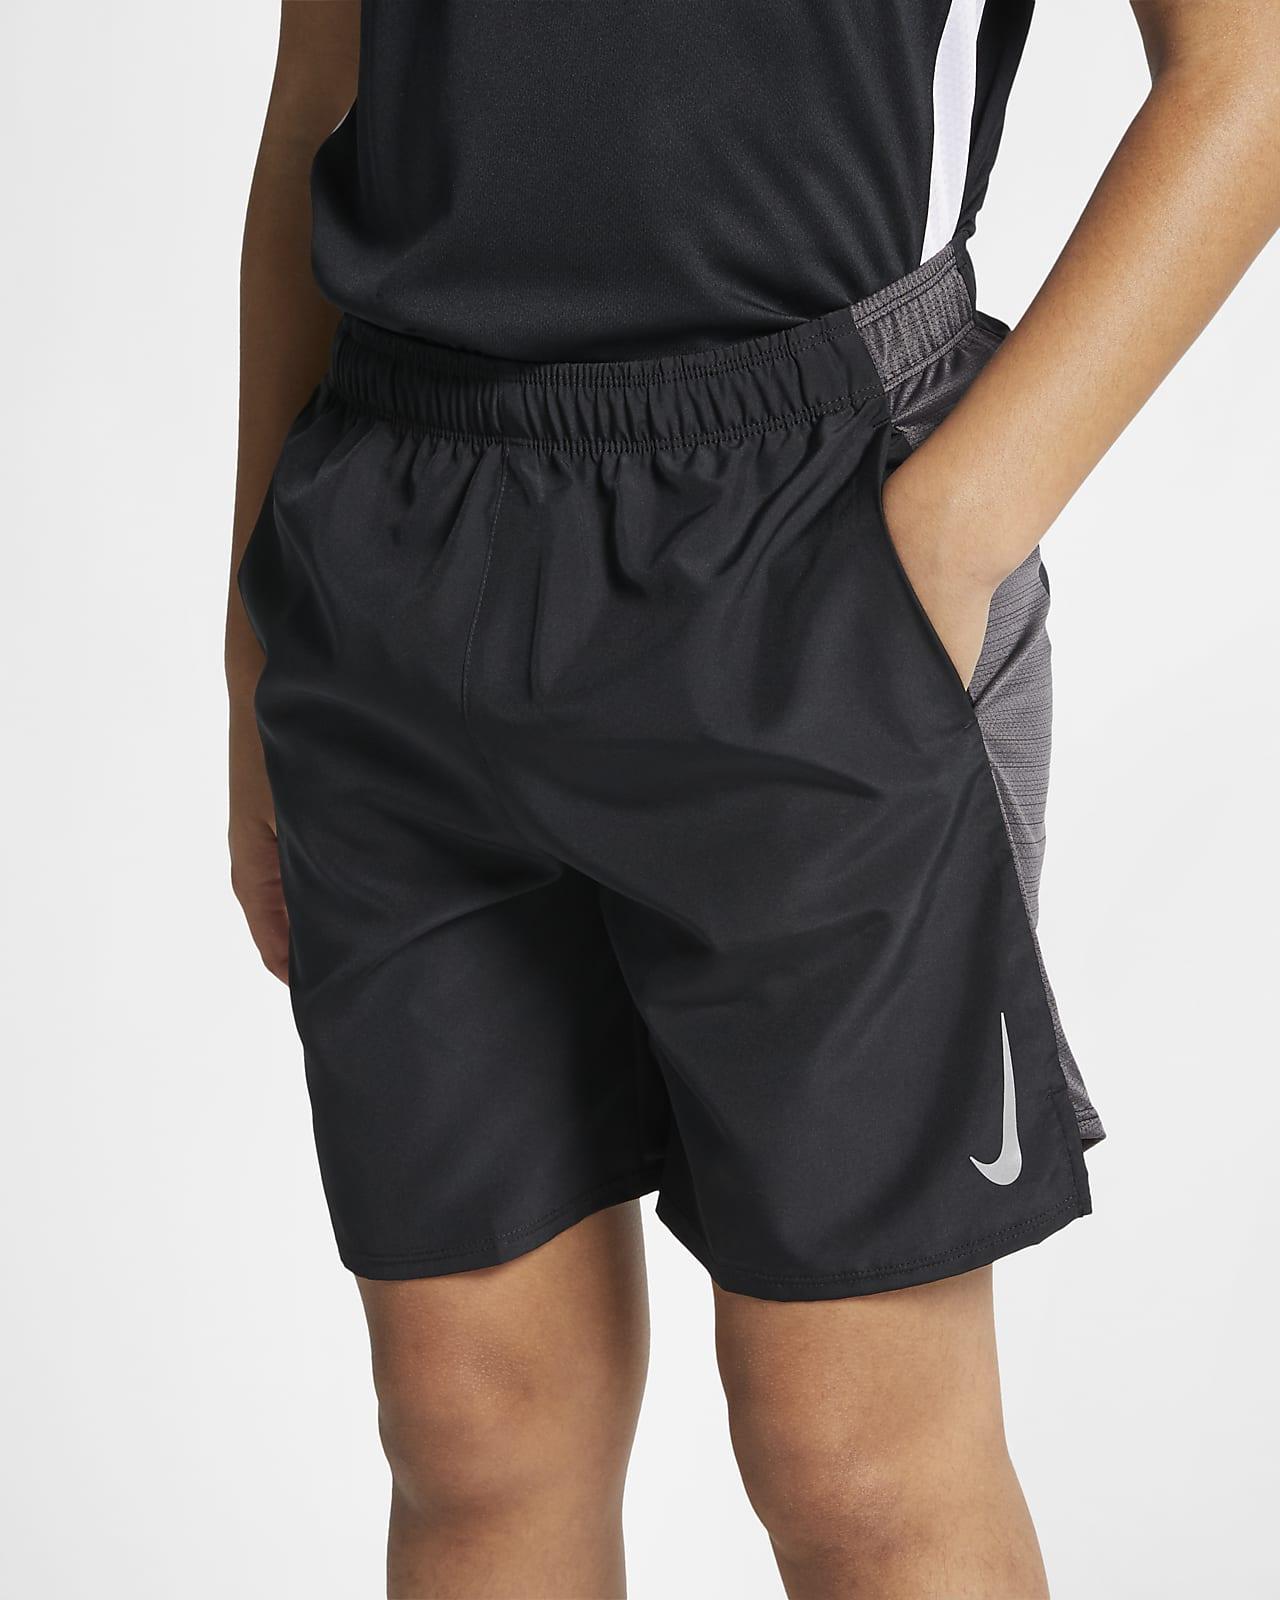 Nike Older Kids' (Boys') Training Shorts. Nike DK